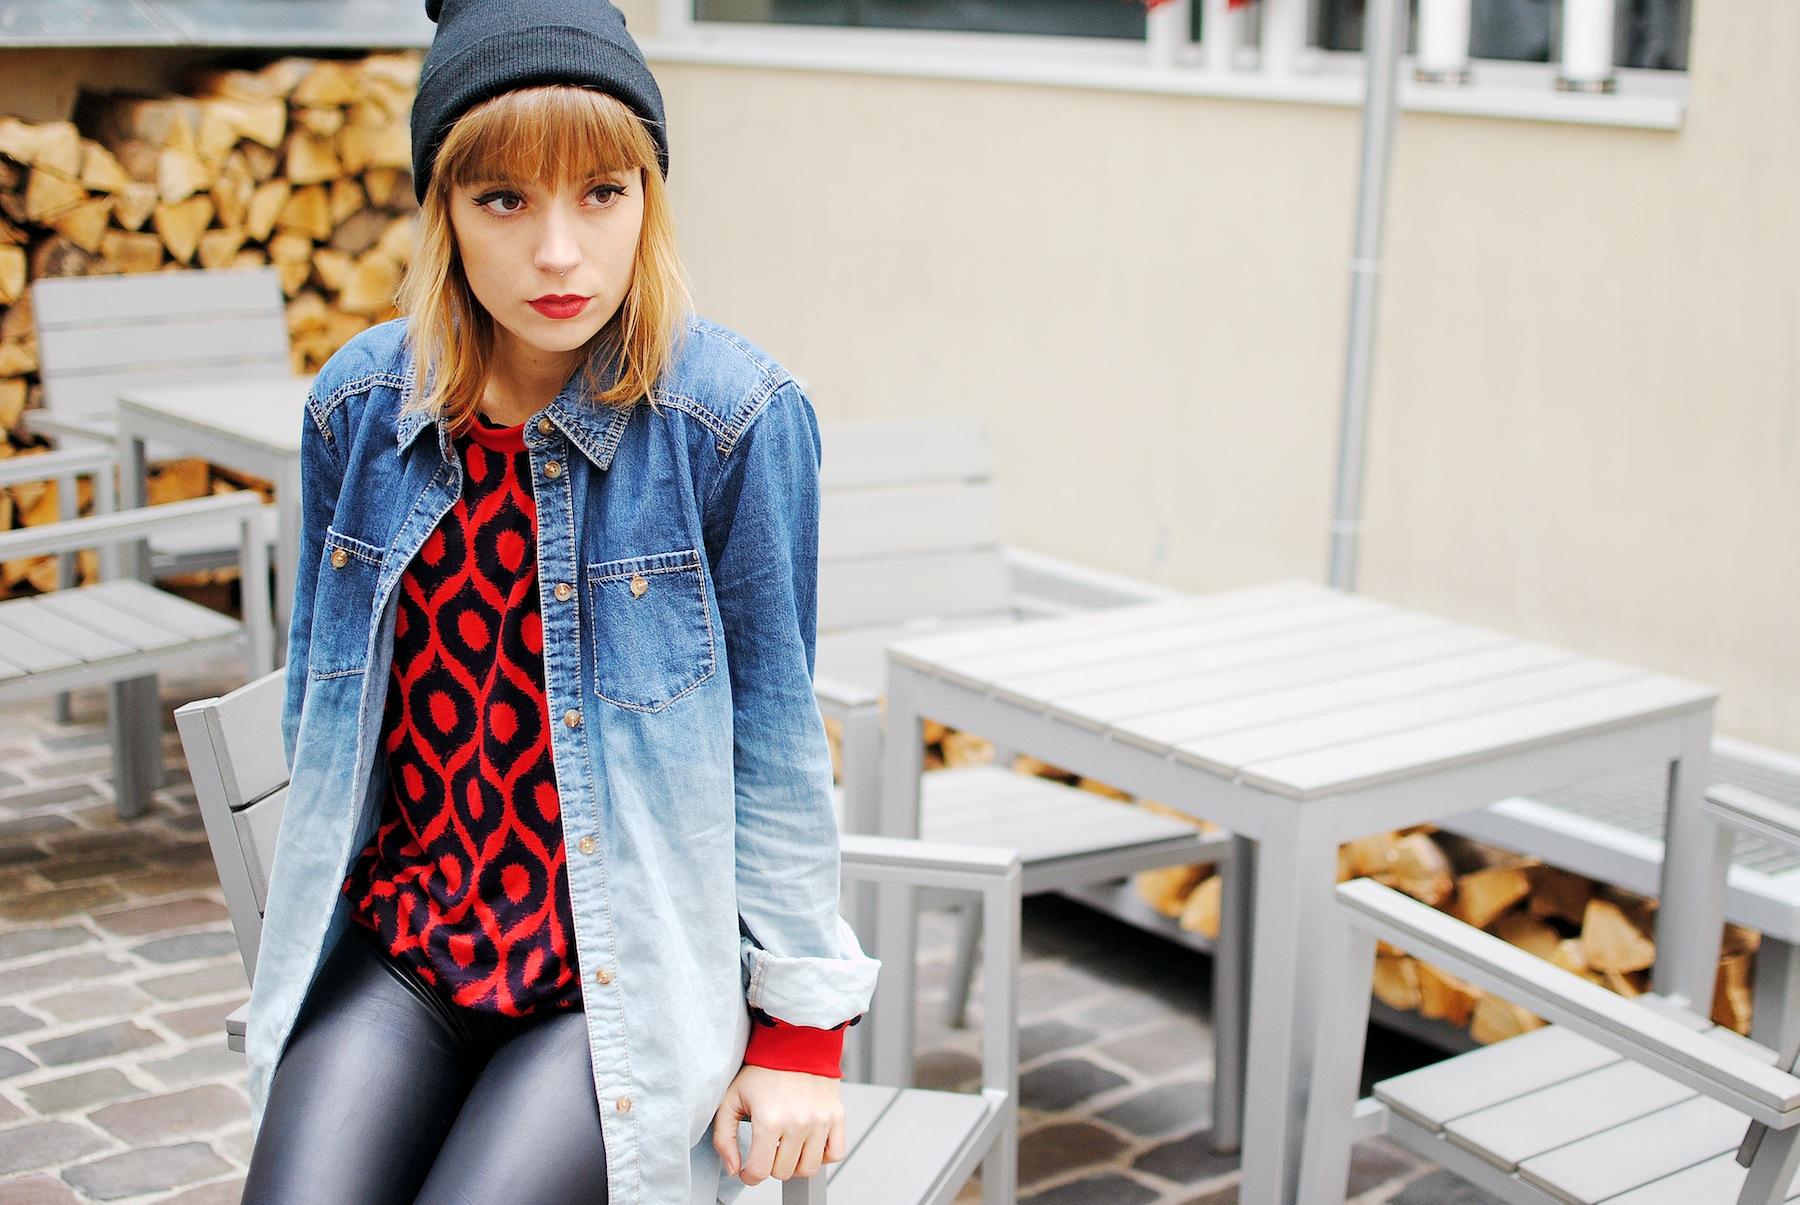 chemise en jeans bicolore look